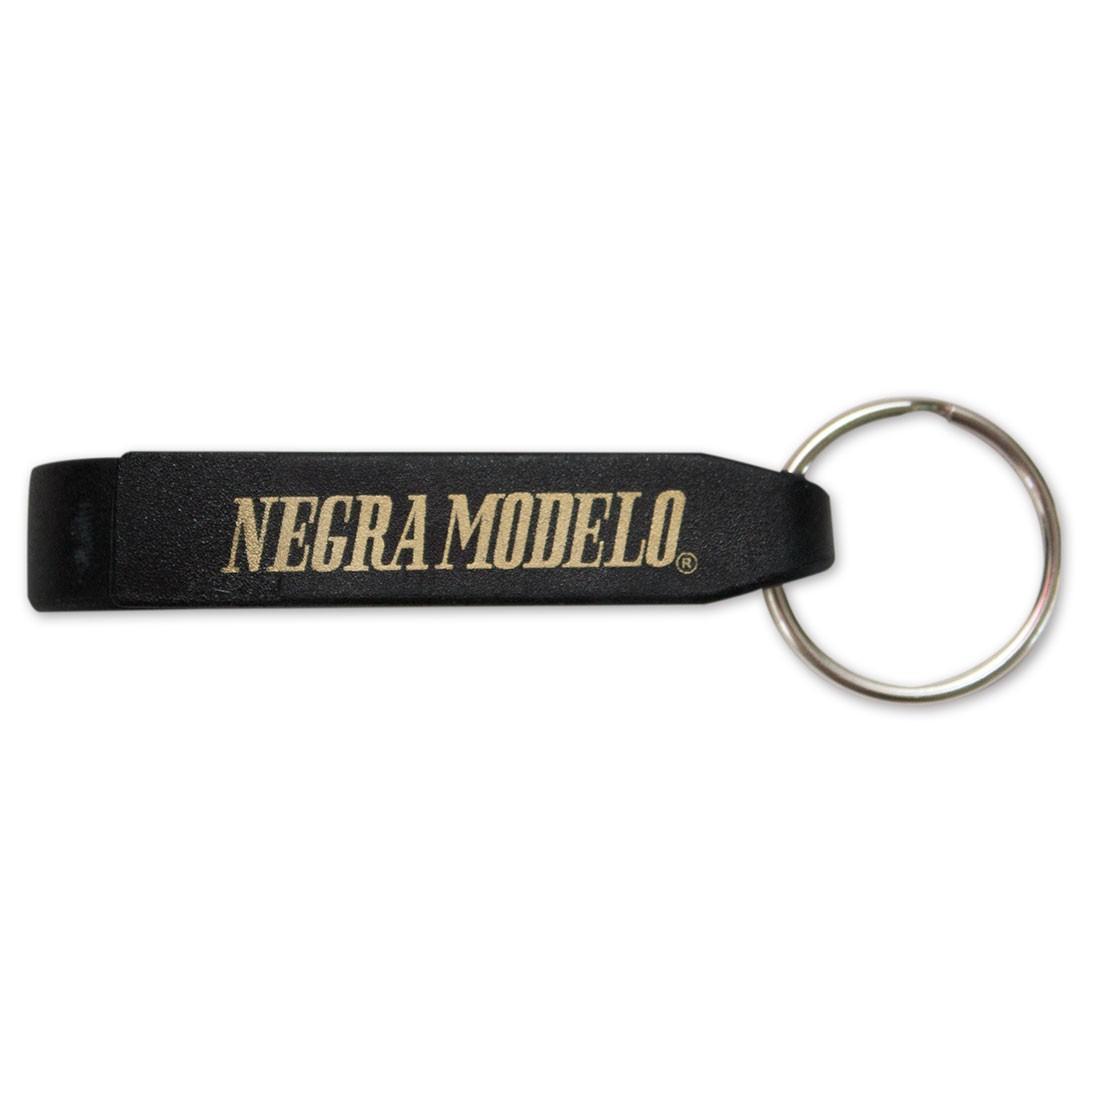 Negra Modelo Black Keychain Beverage Wrench